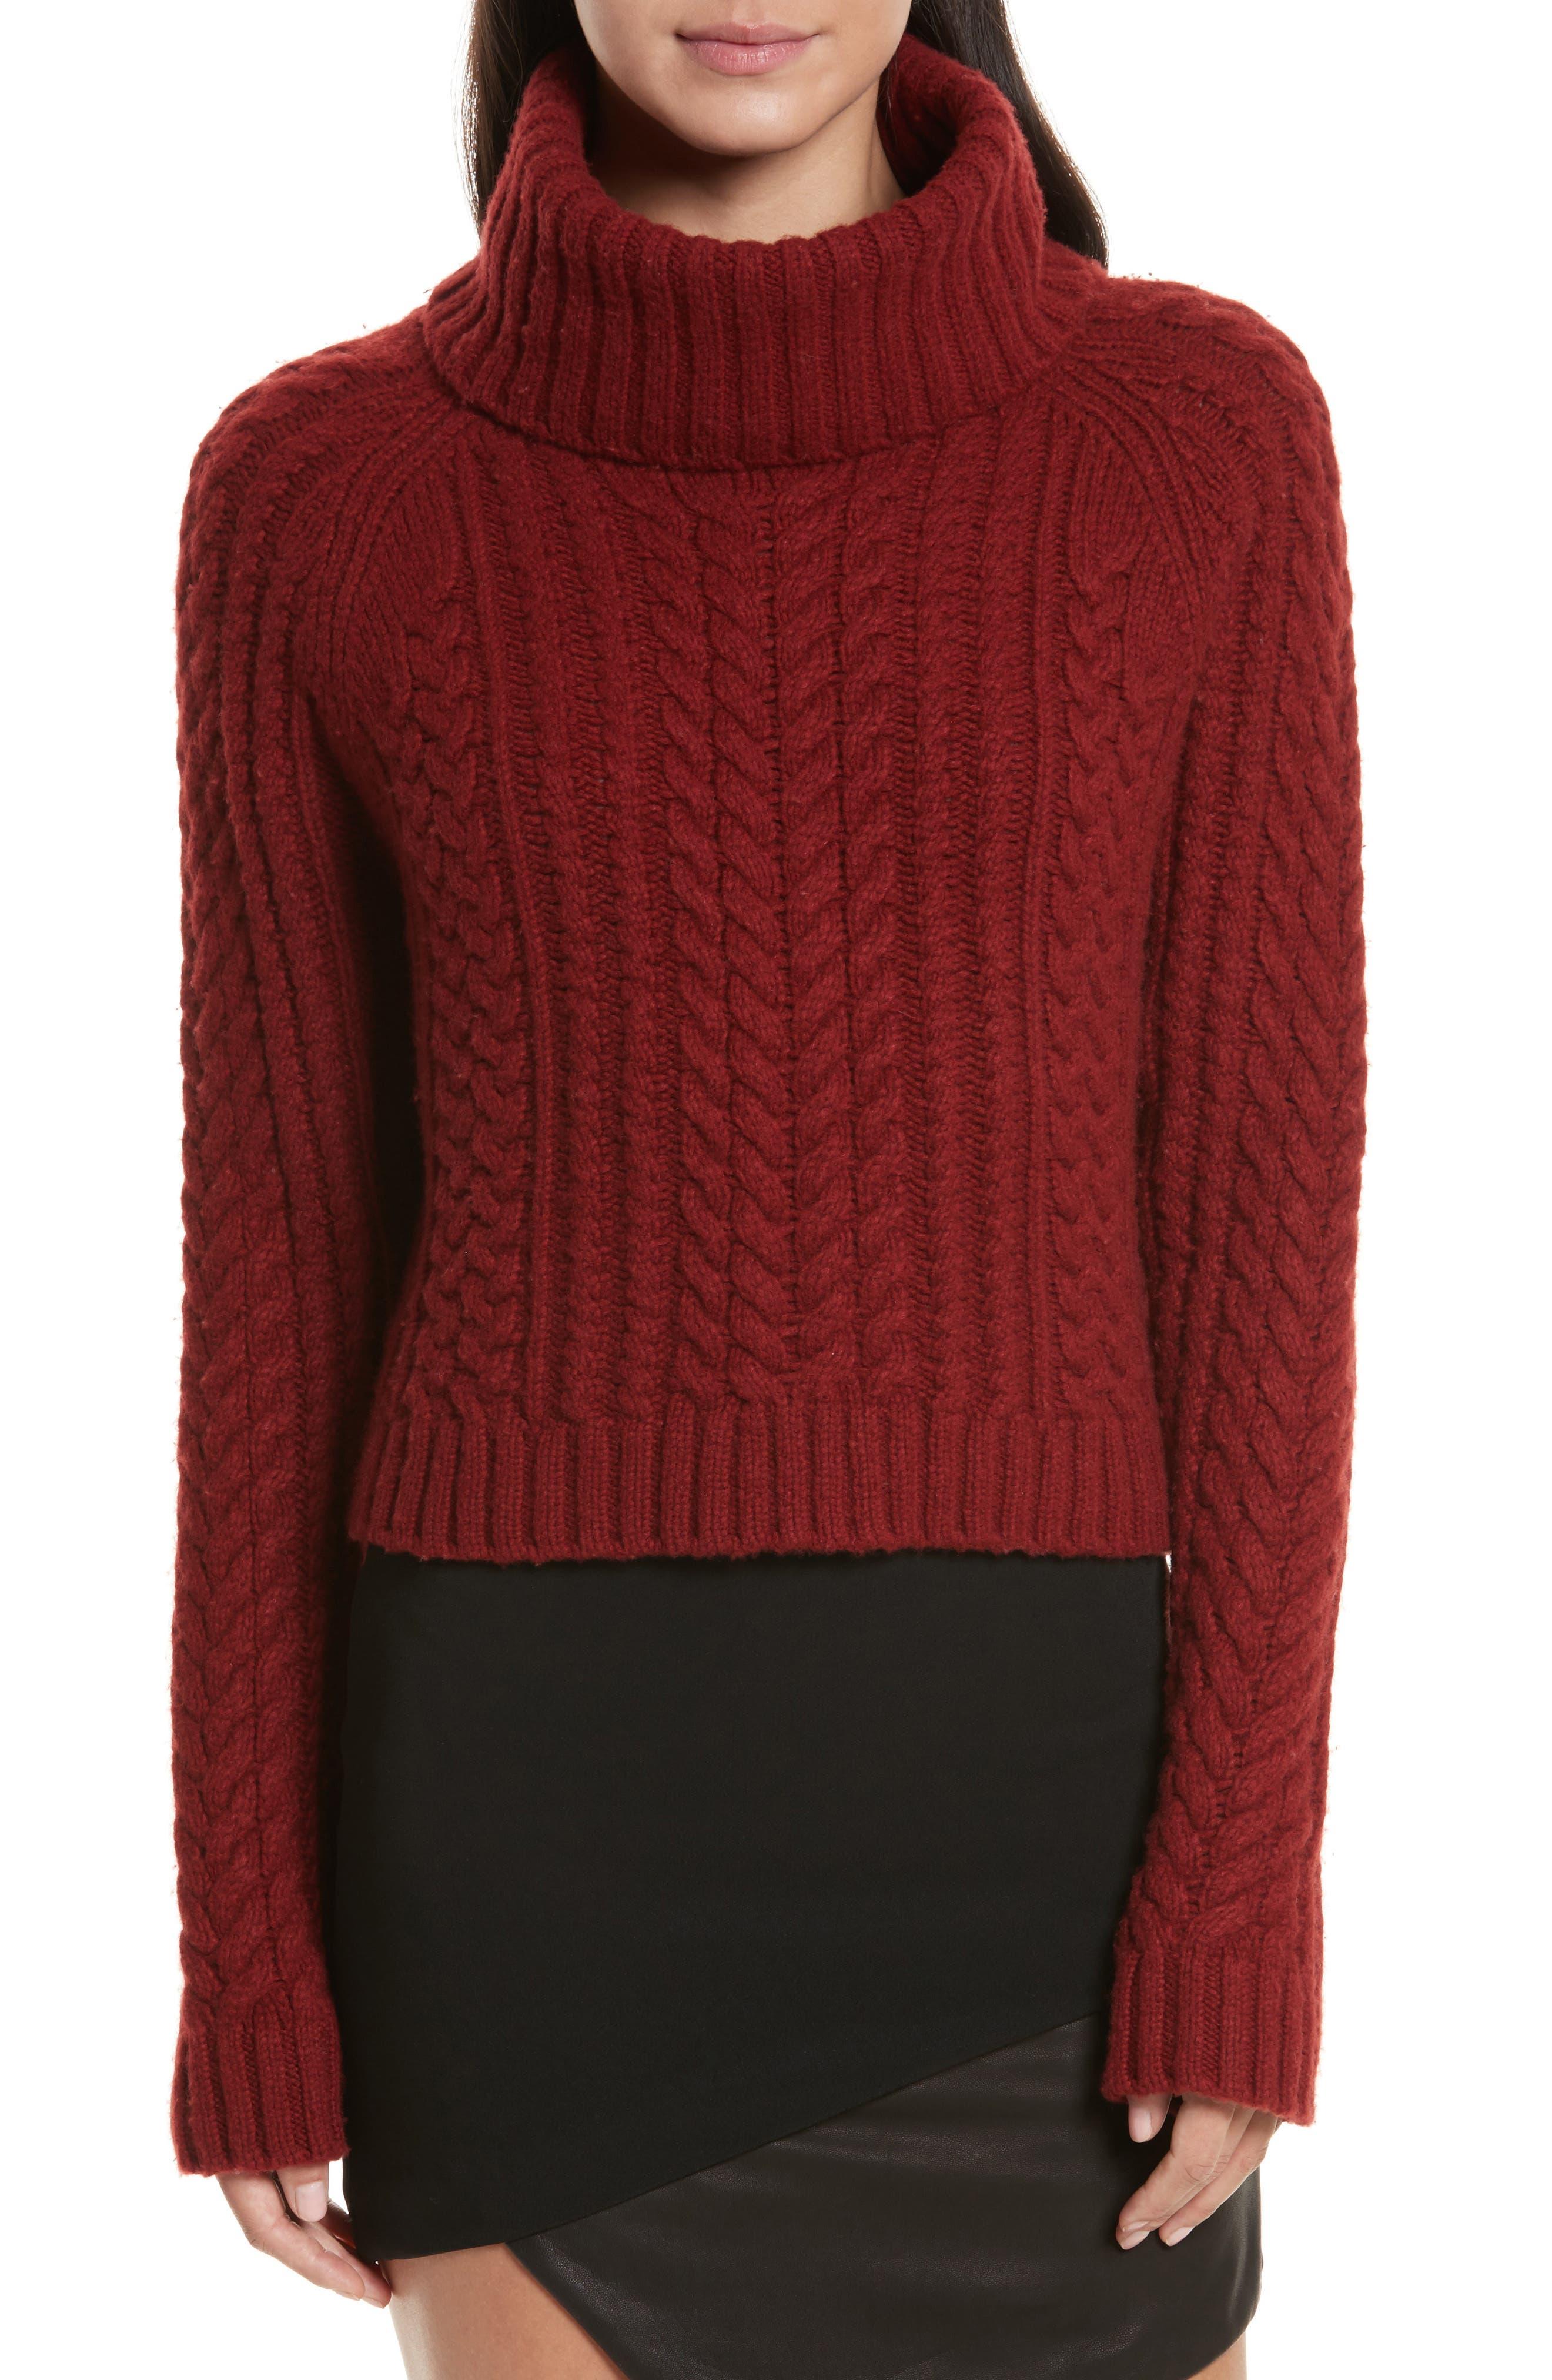 Main Image - Alice + Olivia Tobin Cable Knit Crop Turtleneck Sweater